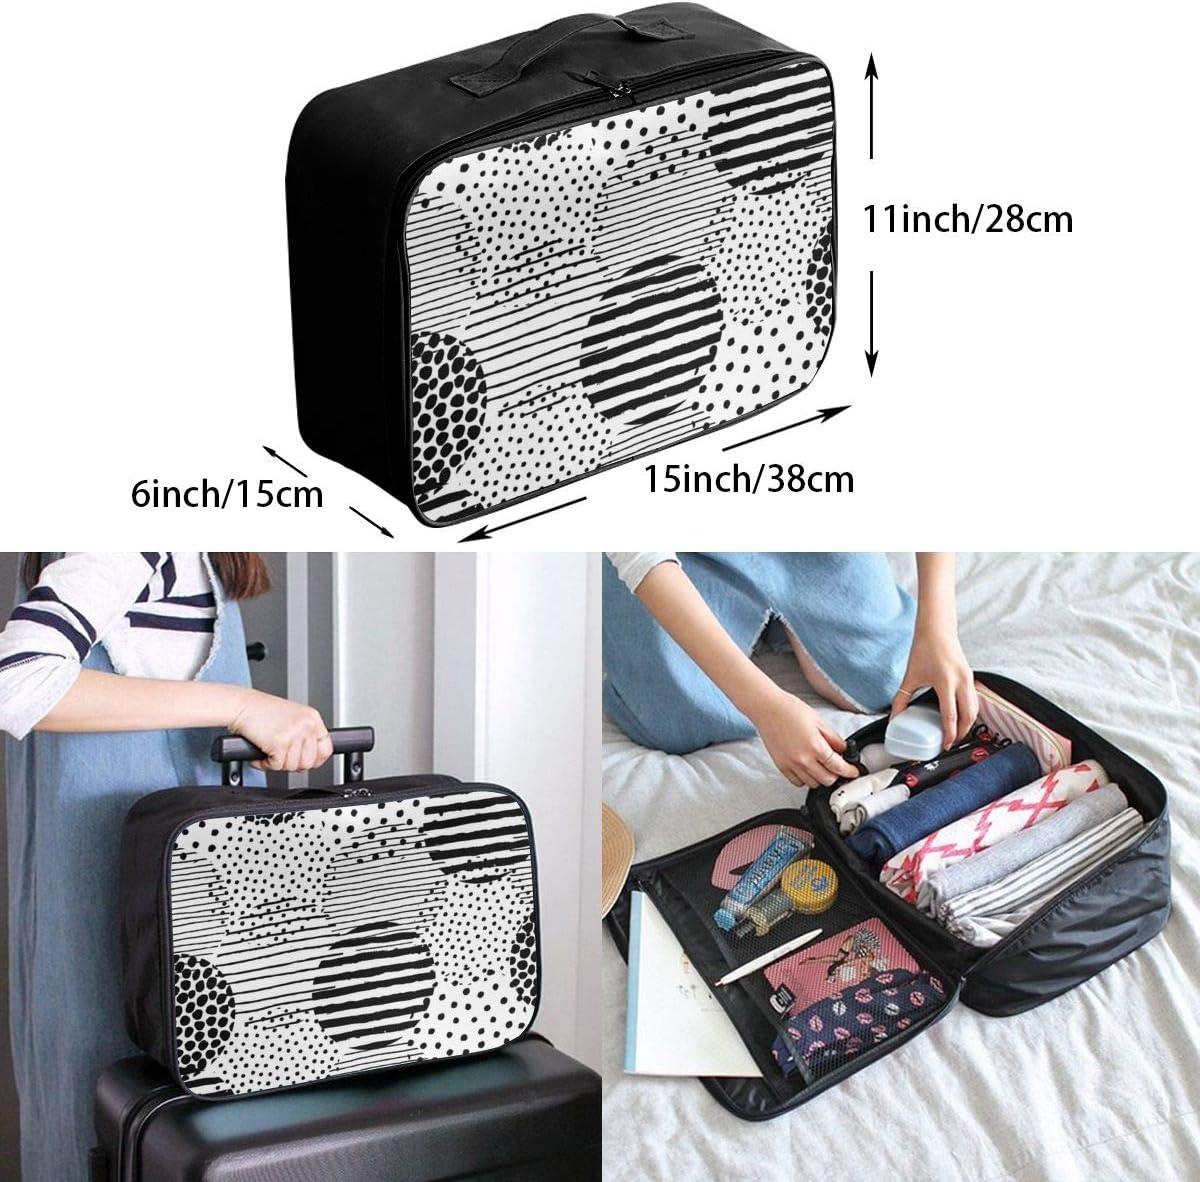 Yunshm Irregular Stripe Dot Brush Pattern Personalized Trolley Handbag Waterproof Unisex Large Capacity For Business Travel Storage